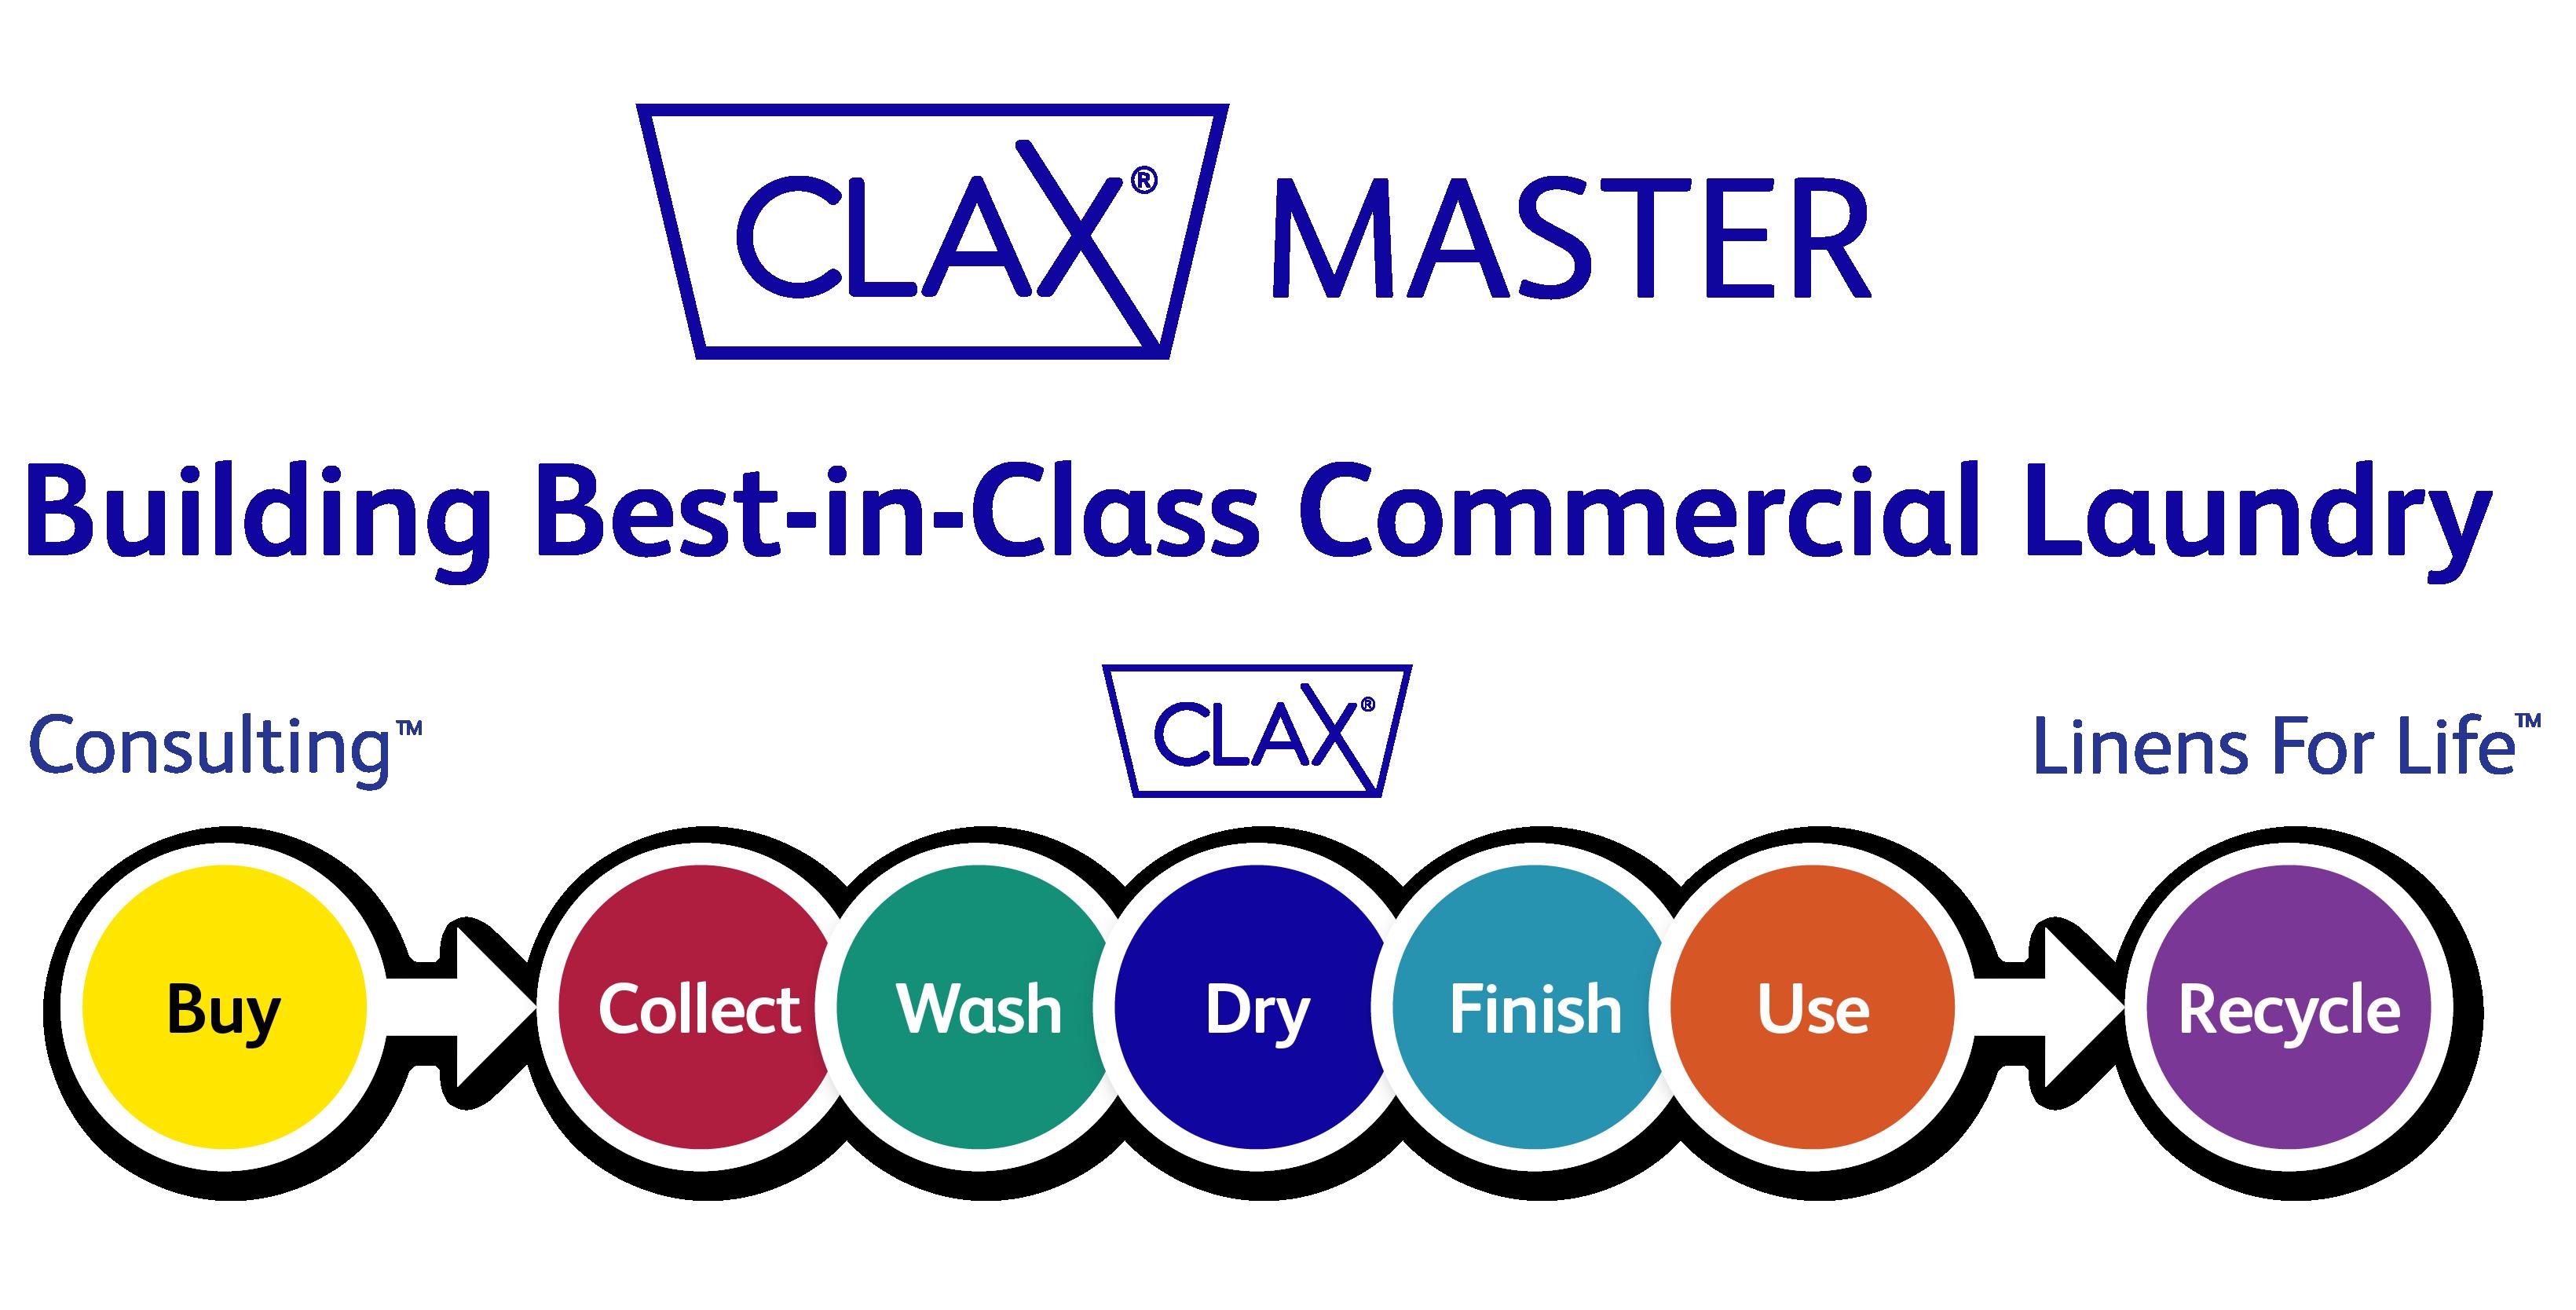 Clax Master